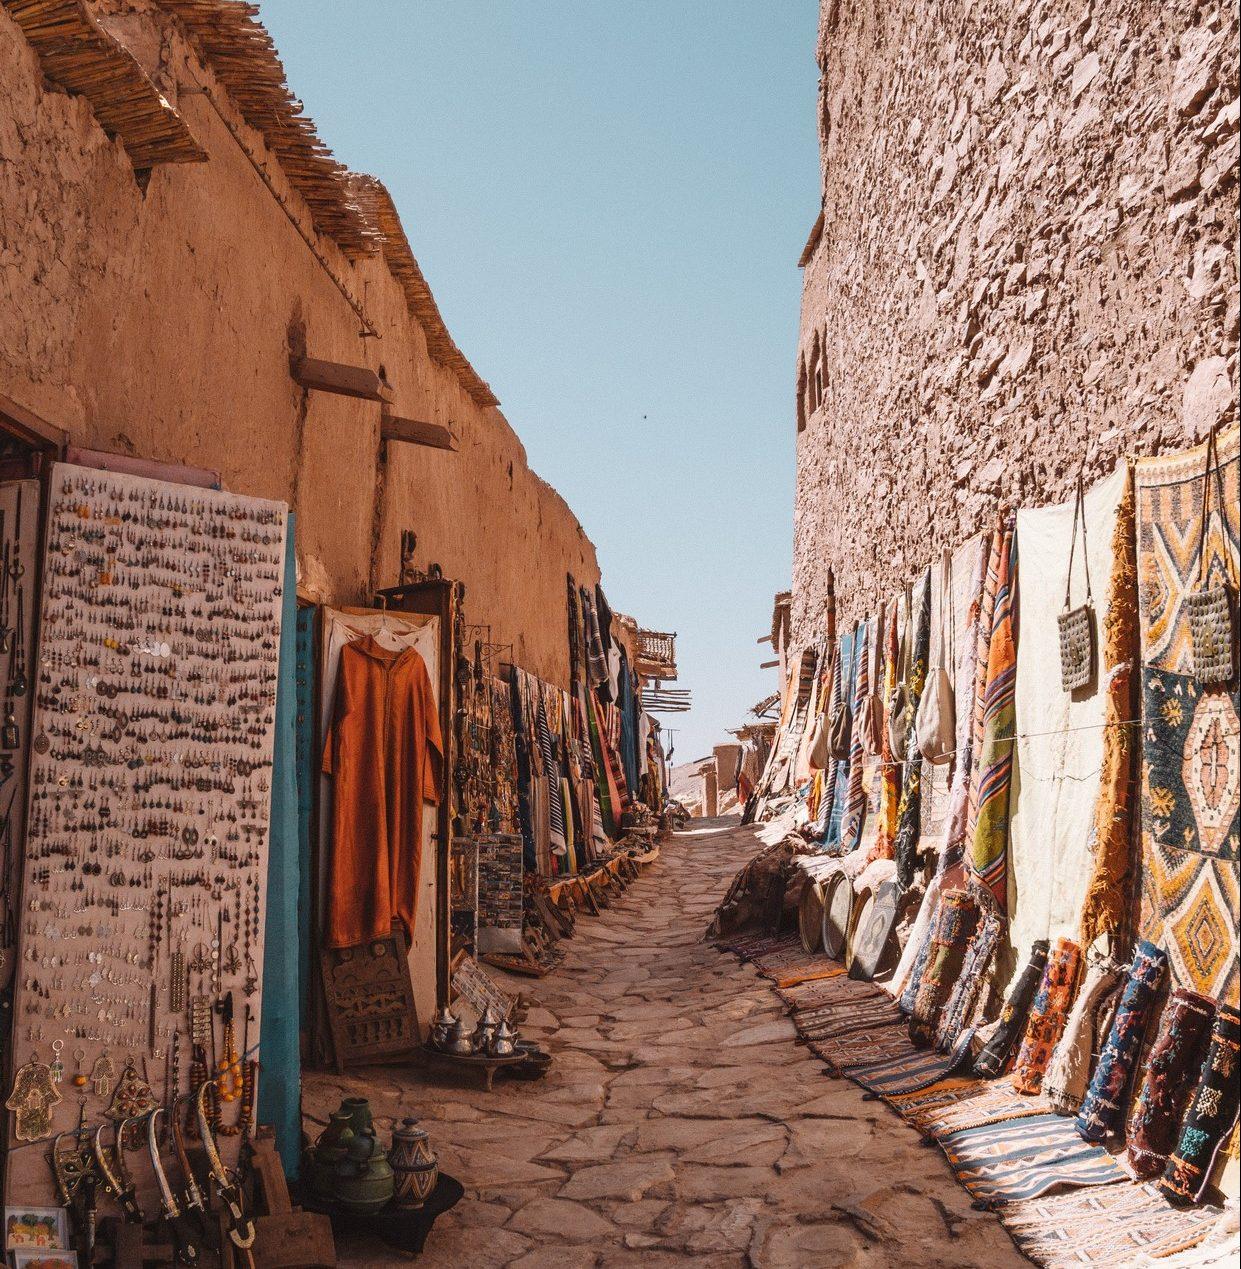 Anti-Atlas & Sahara Desert Tour from Marrakech 6